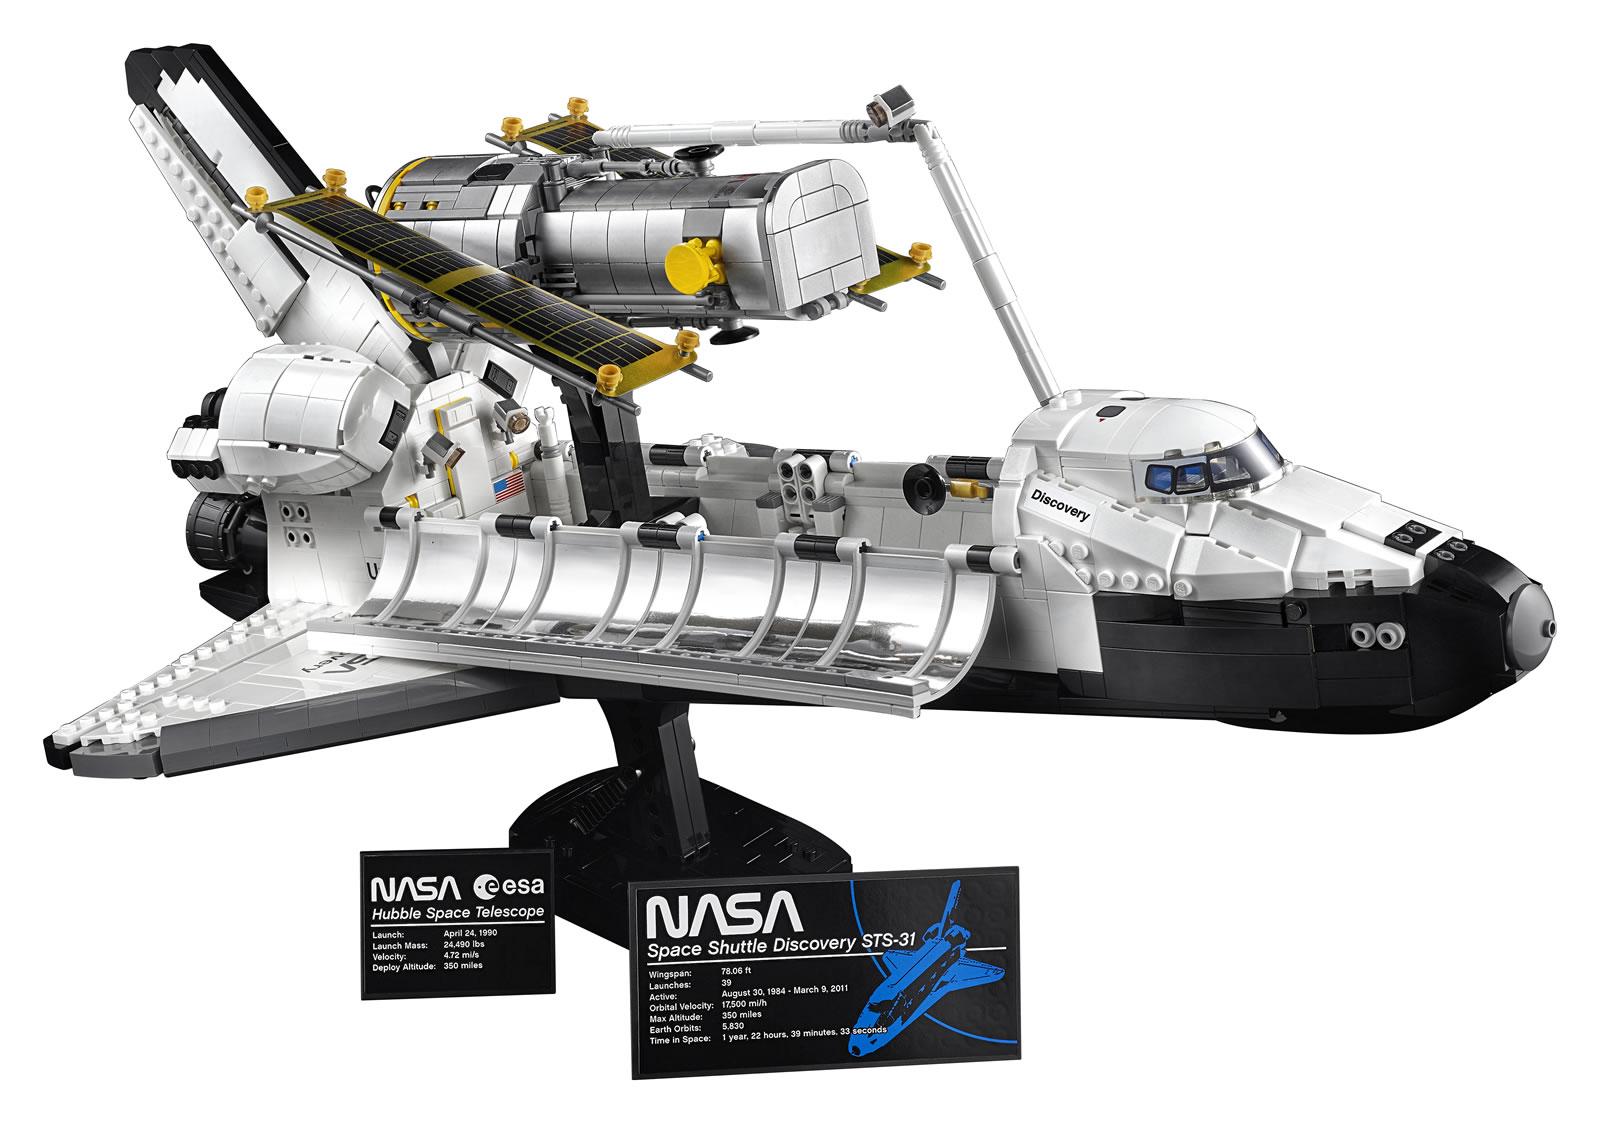 La Saturn V en LEGO! - Page 5 10283-lego-nasa-space-shuttle-discovery_2